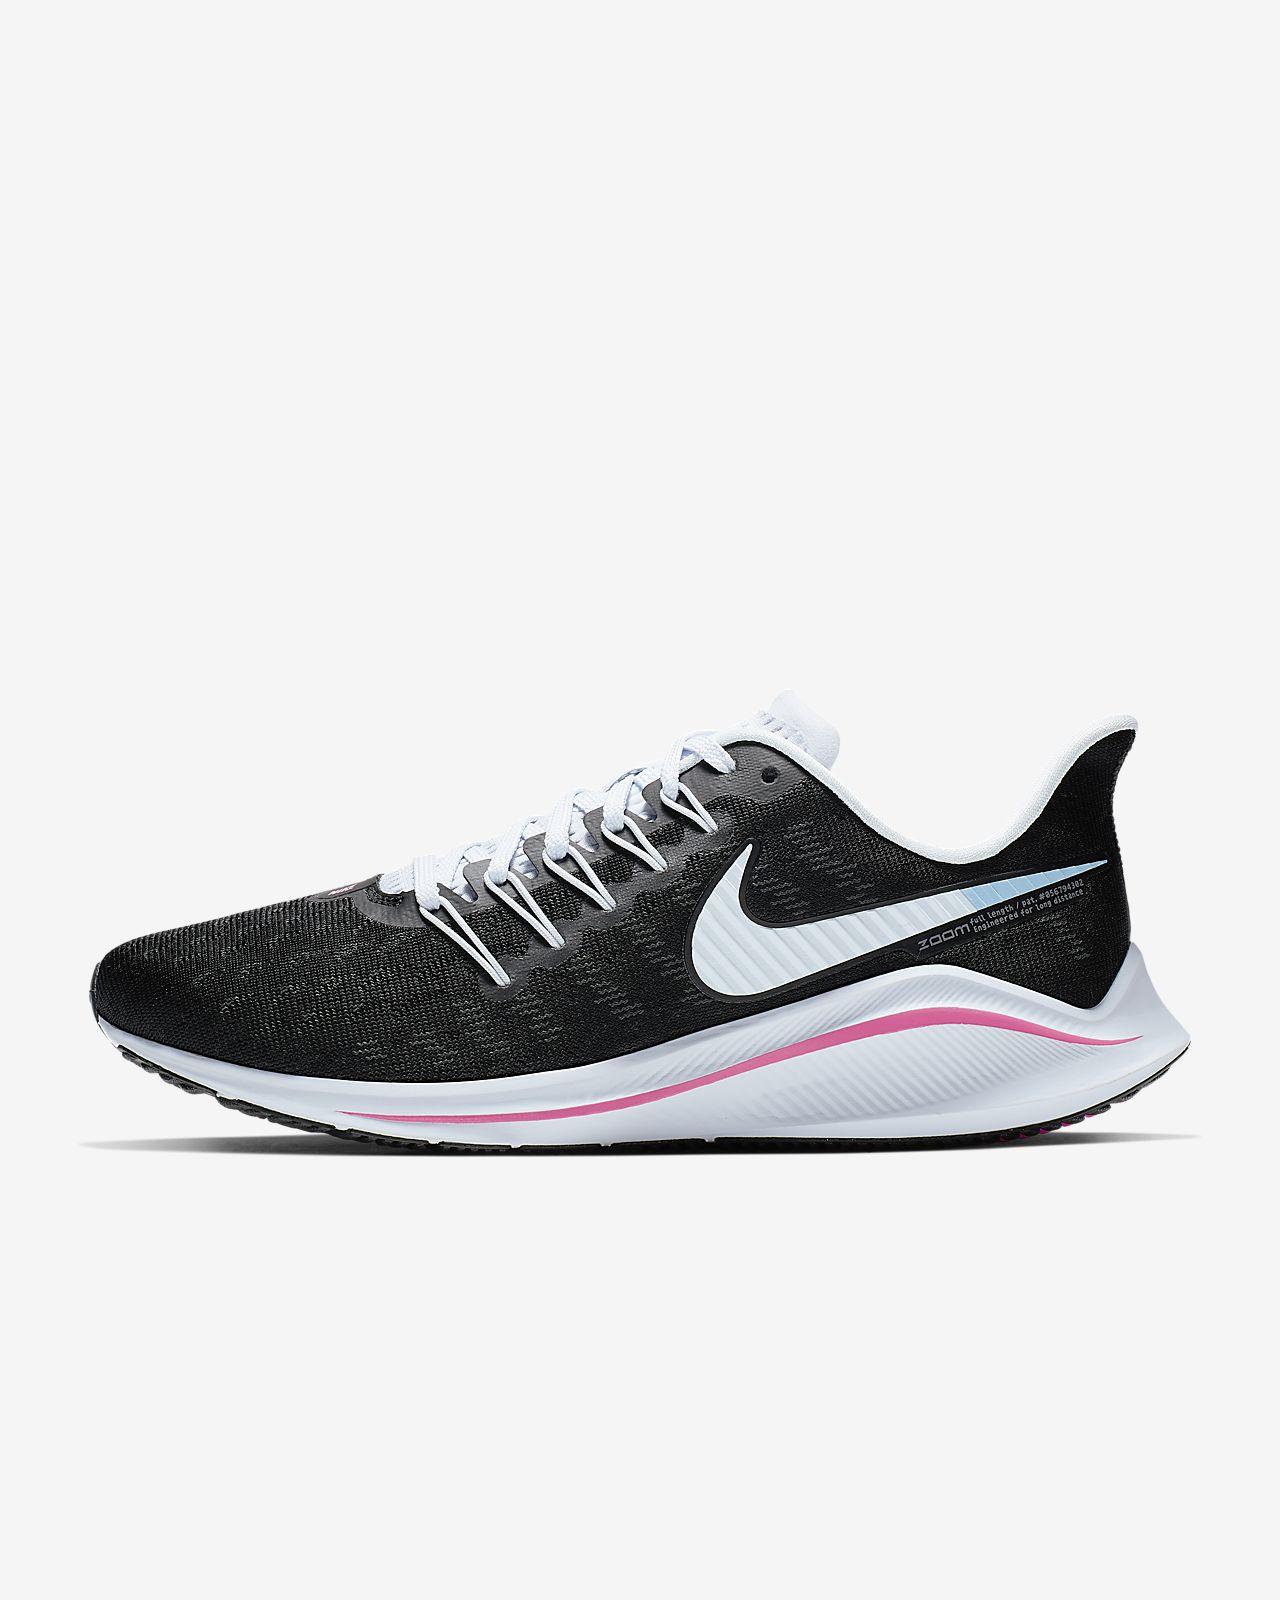 Nike Air Zoom Vomero 14 Damen-Laufschuh